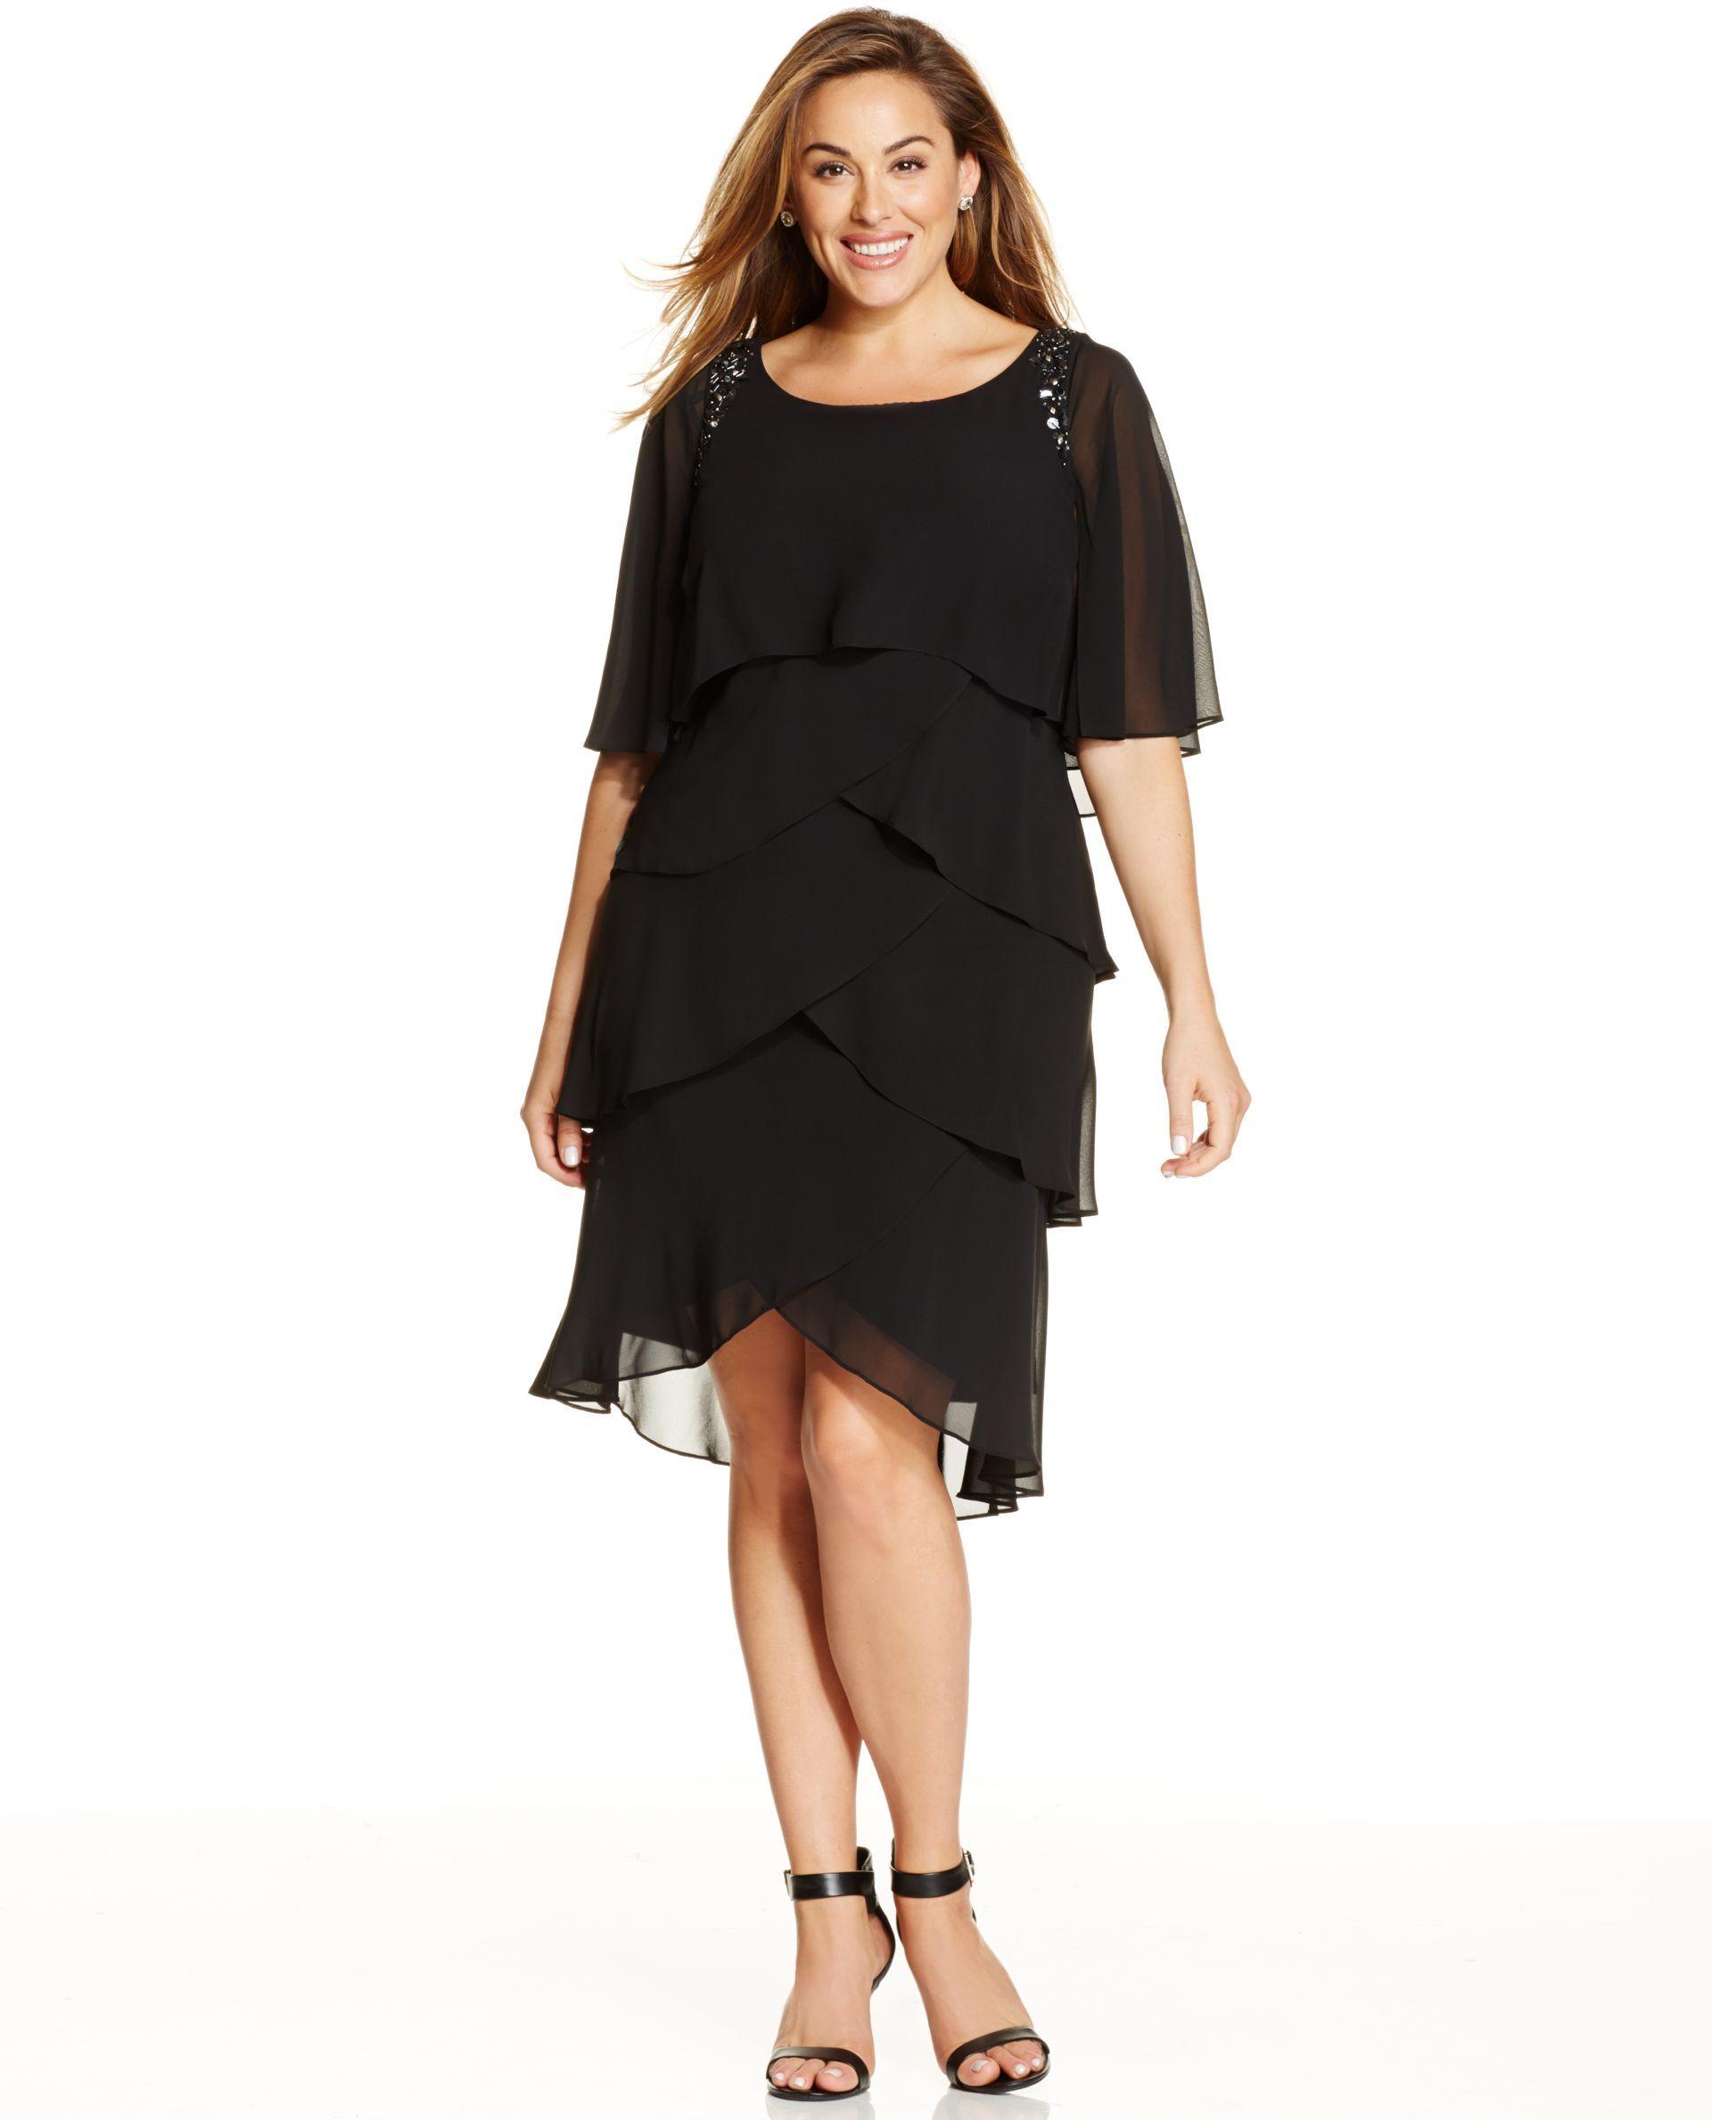 Sl sl fashion dresses - Sl Fashions Plus Size Beaded Tiered Shift Dress